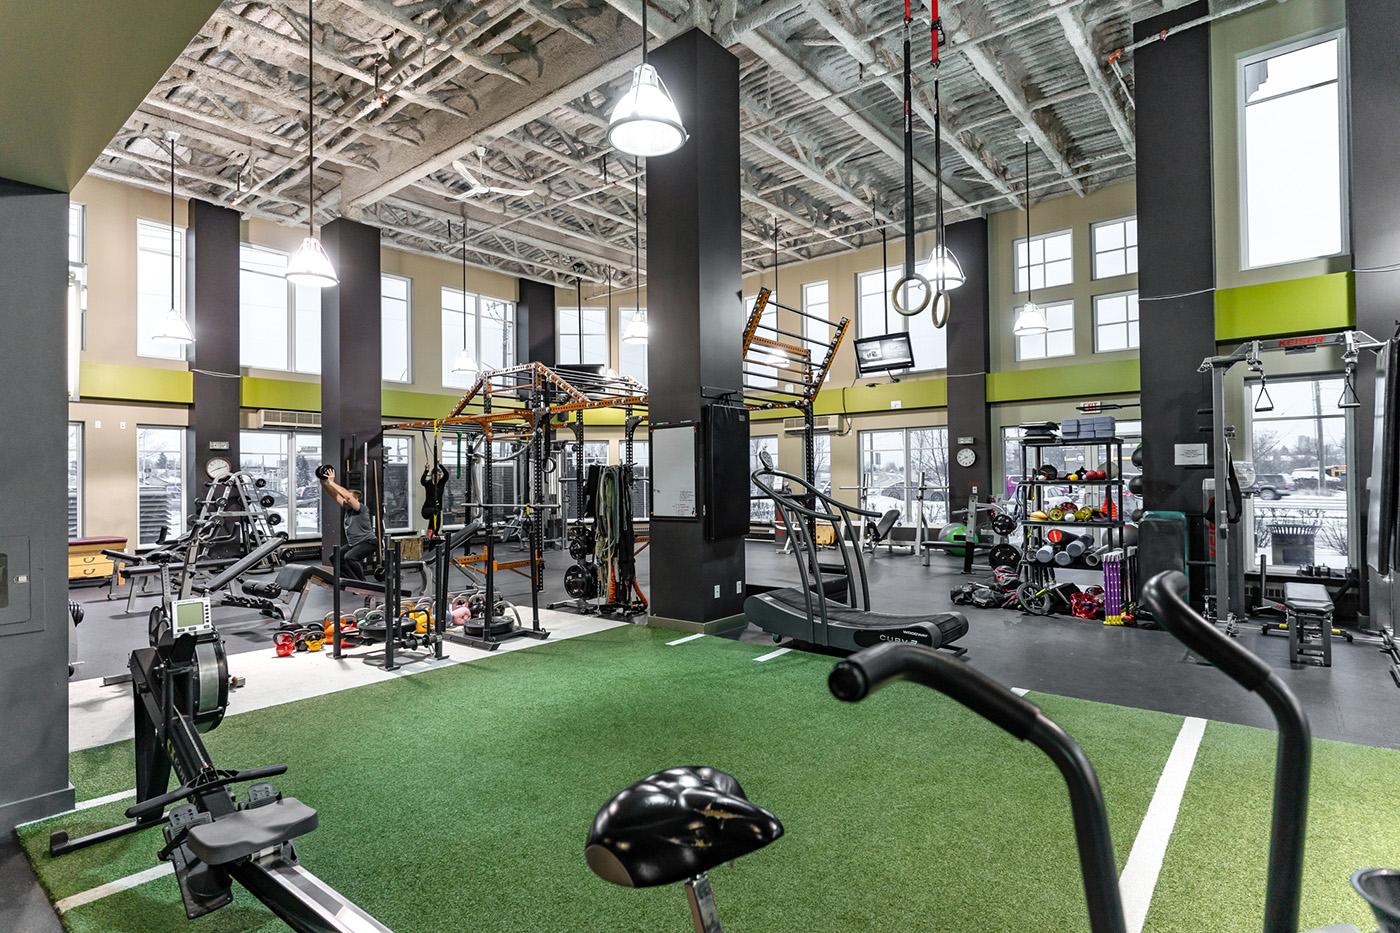 cityfit-gym-personal-training-calgary-workout-facility-inglewood-9.jpg